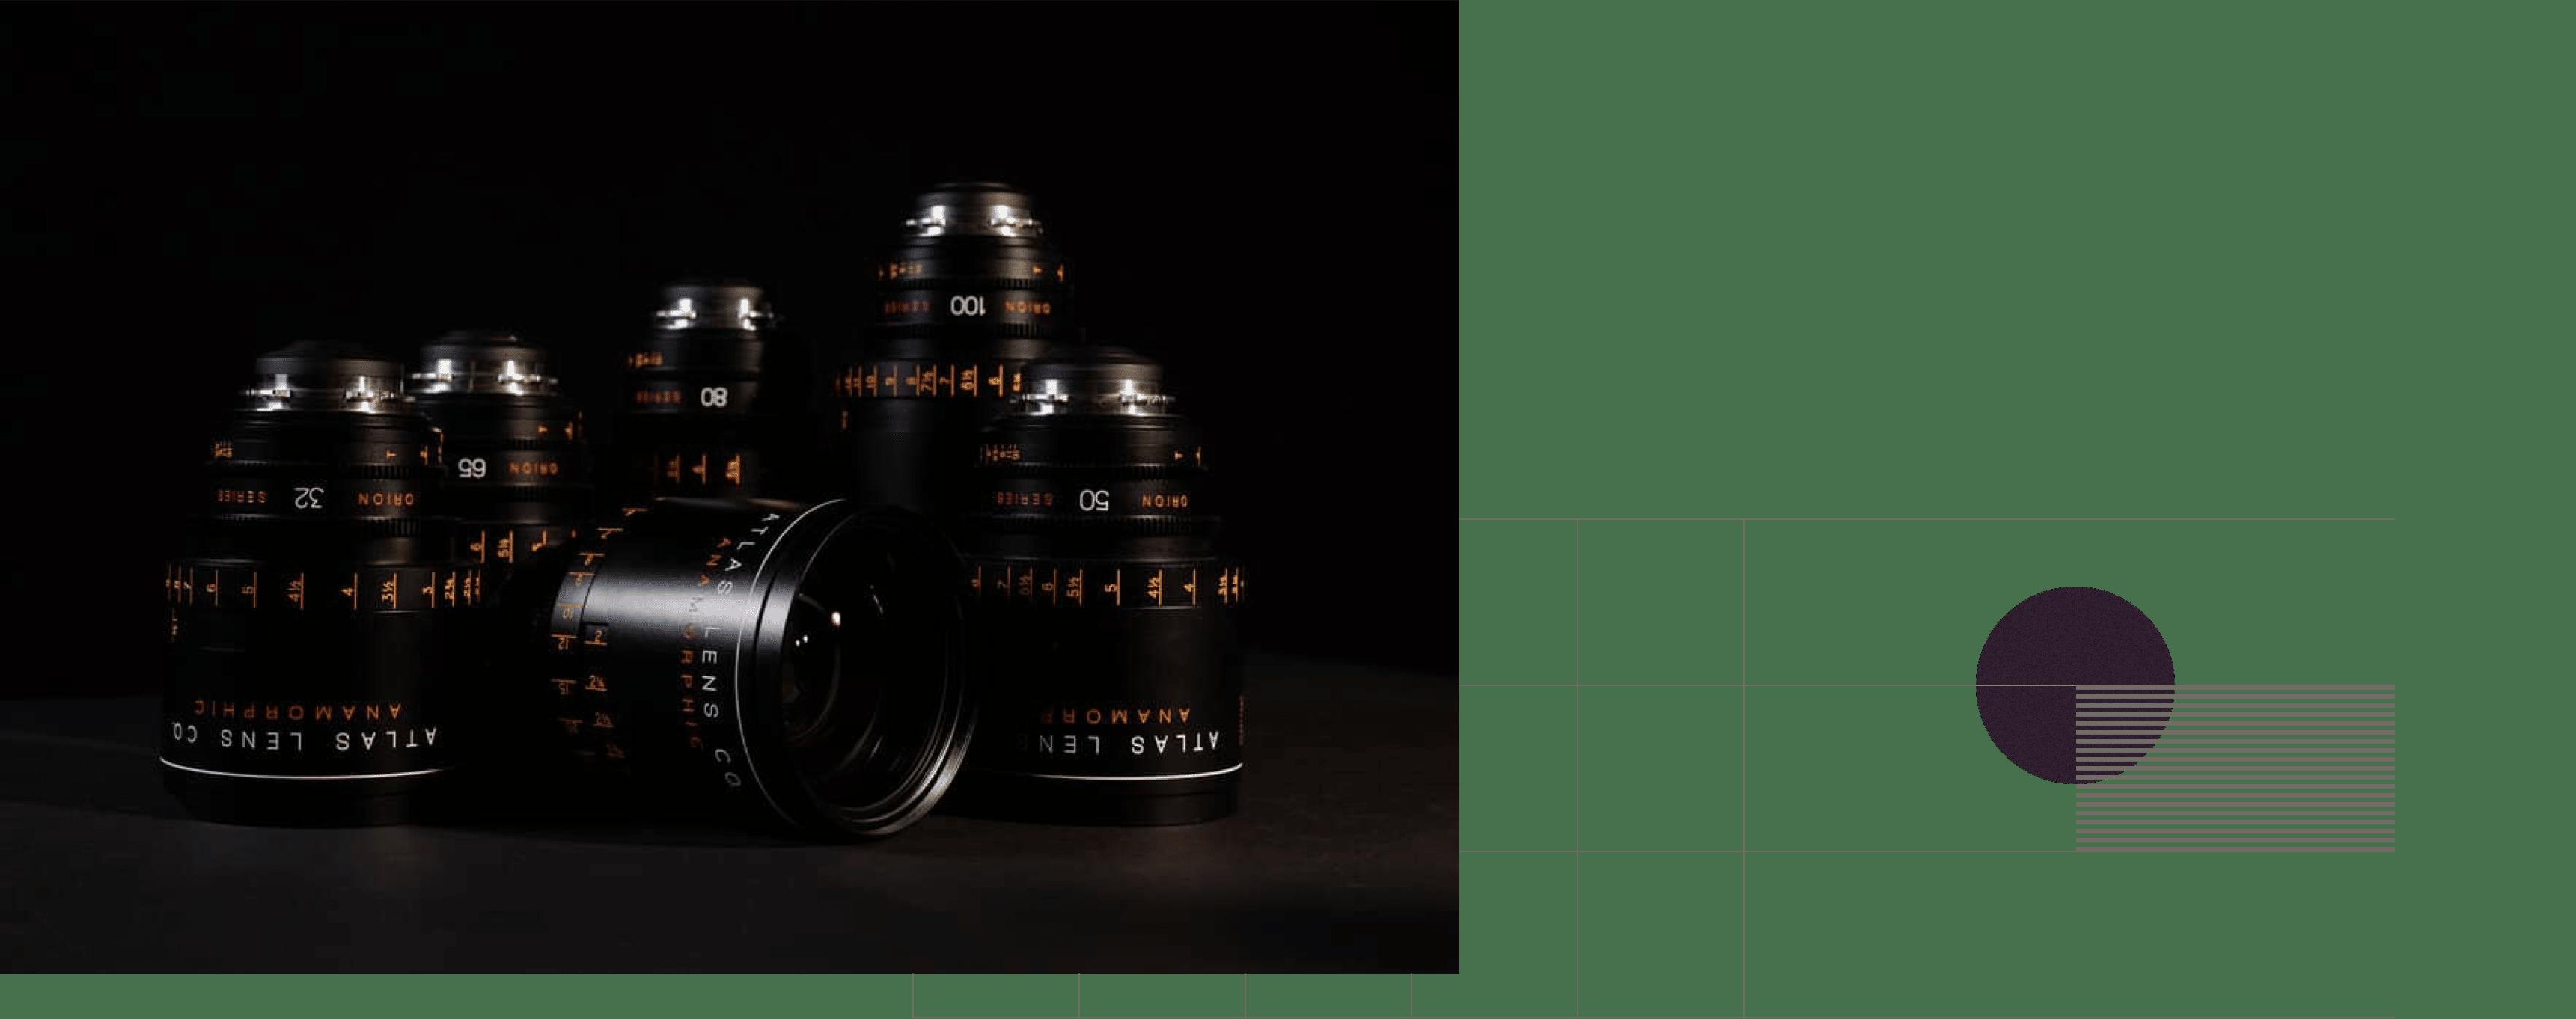 camera lenses with background illustration